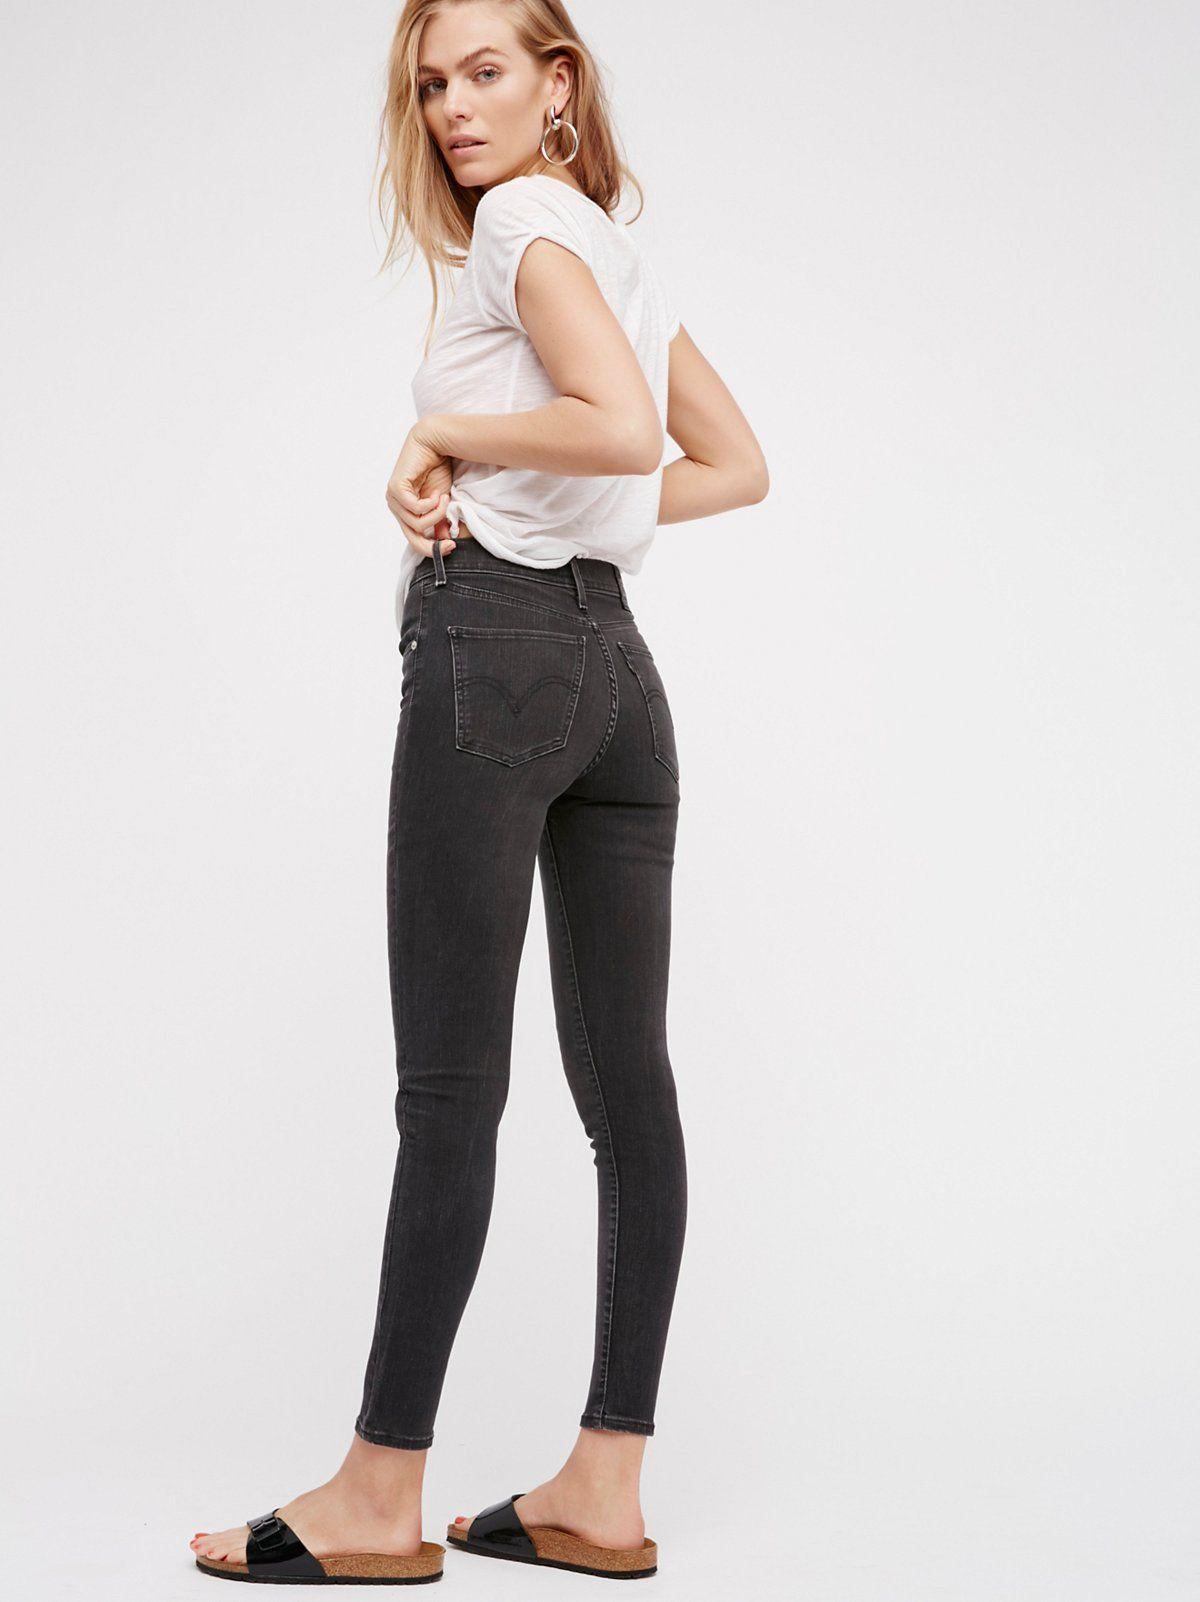 kostengünstig 2347e 33b9c Levi's Mile High Super Skinny Jeans | Sartorial things. in ...